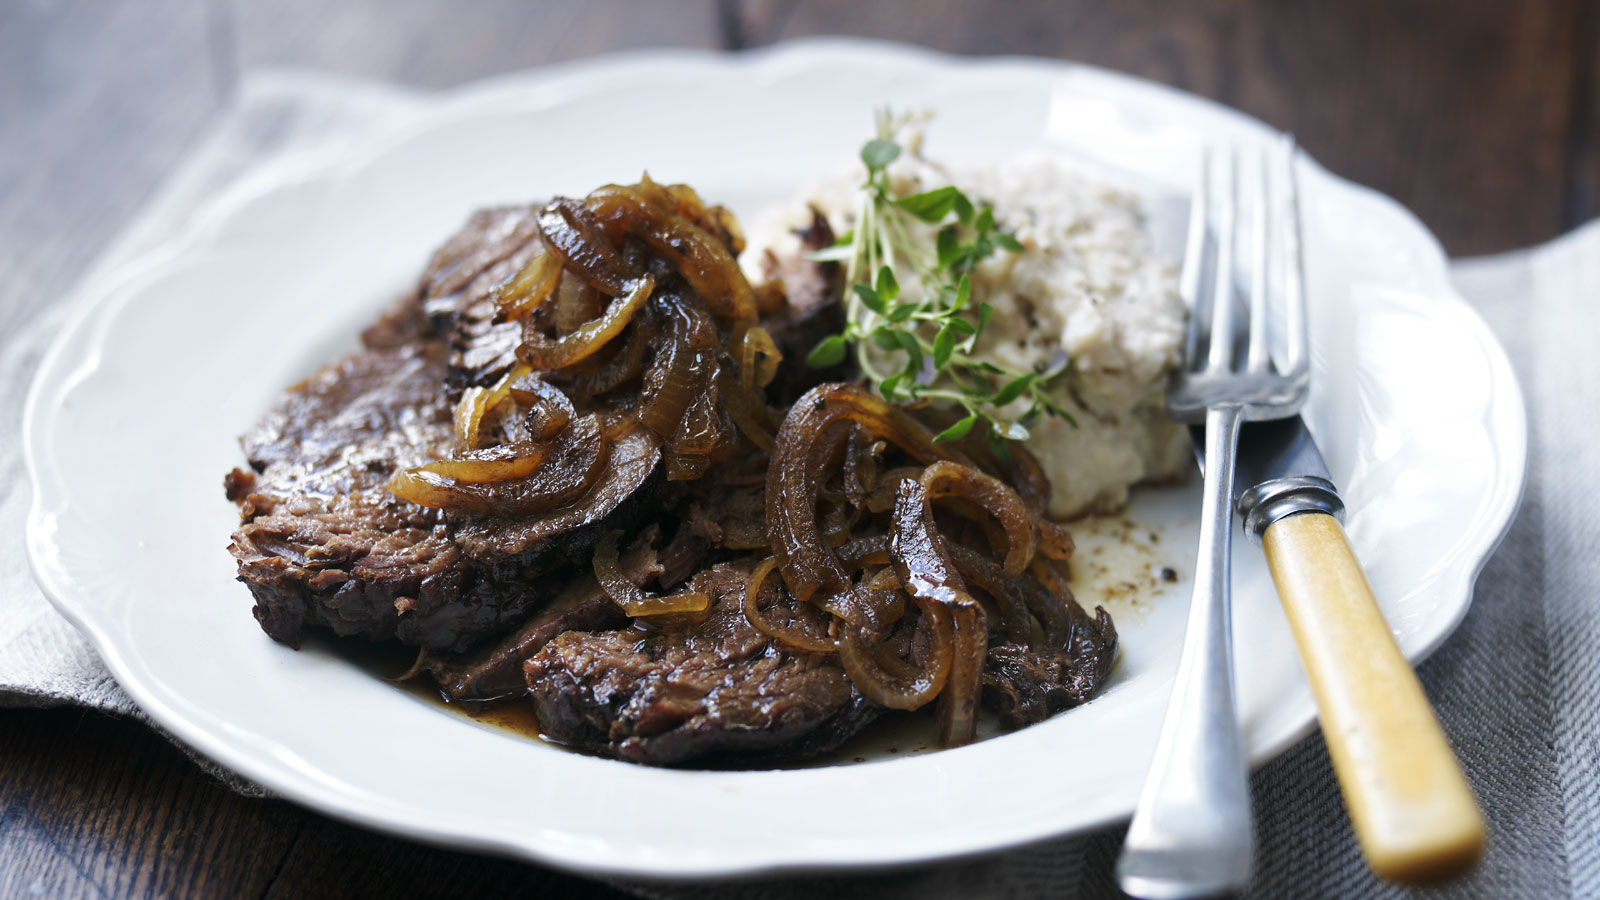 Slow Cooker Beef Brisket With Bean Mash